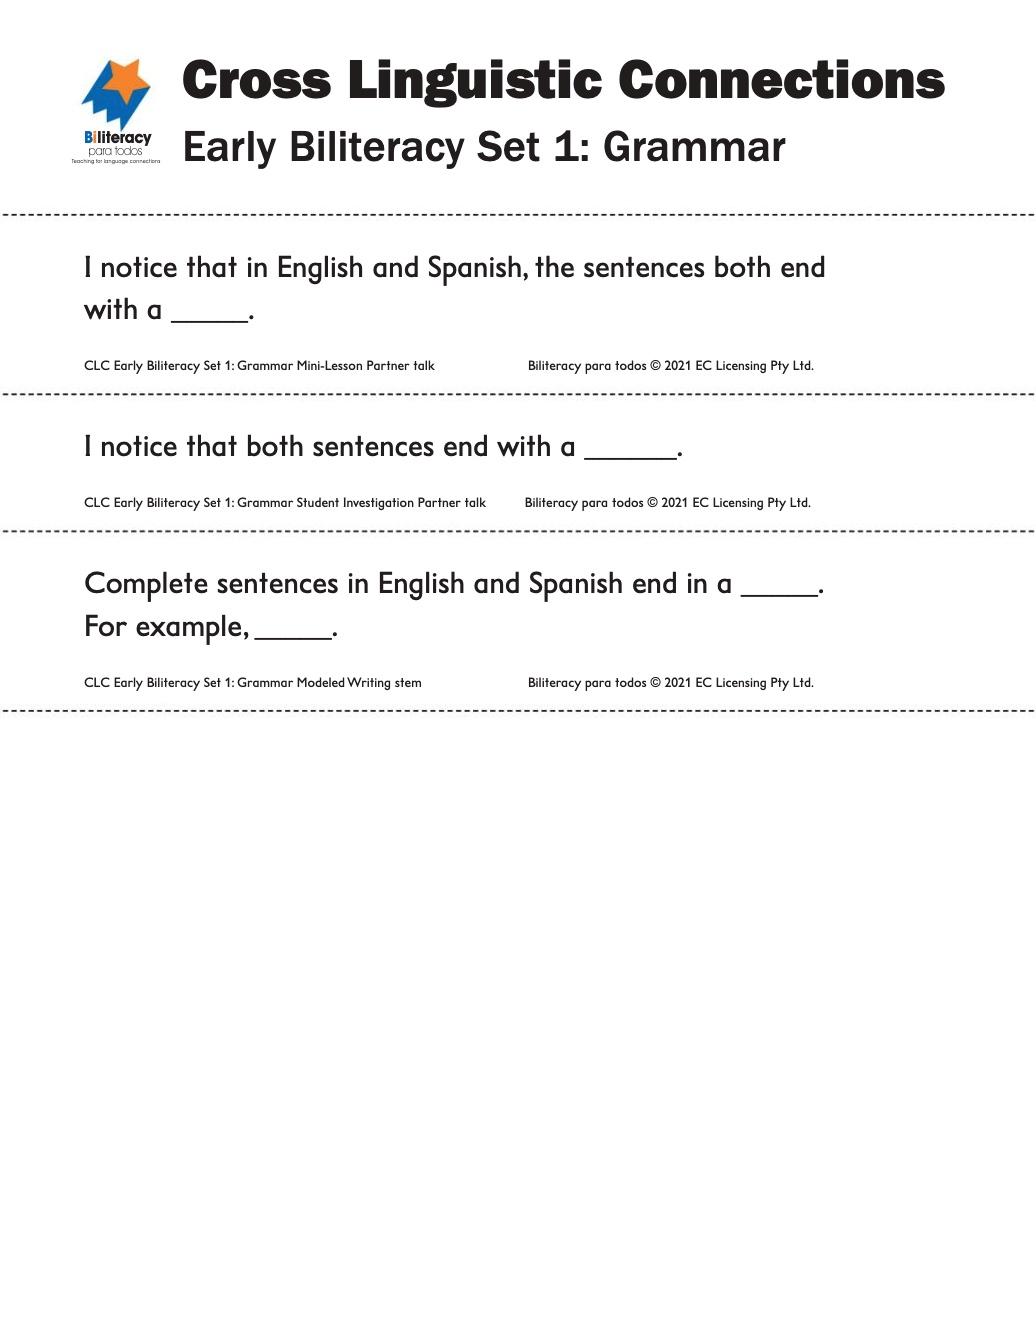 CLC Sentence Stems